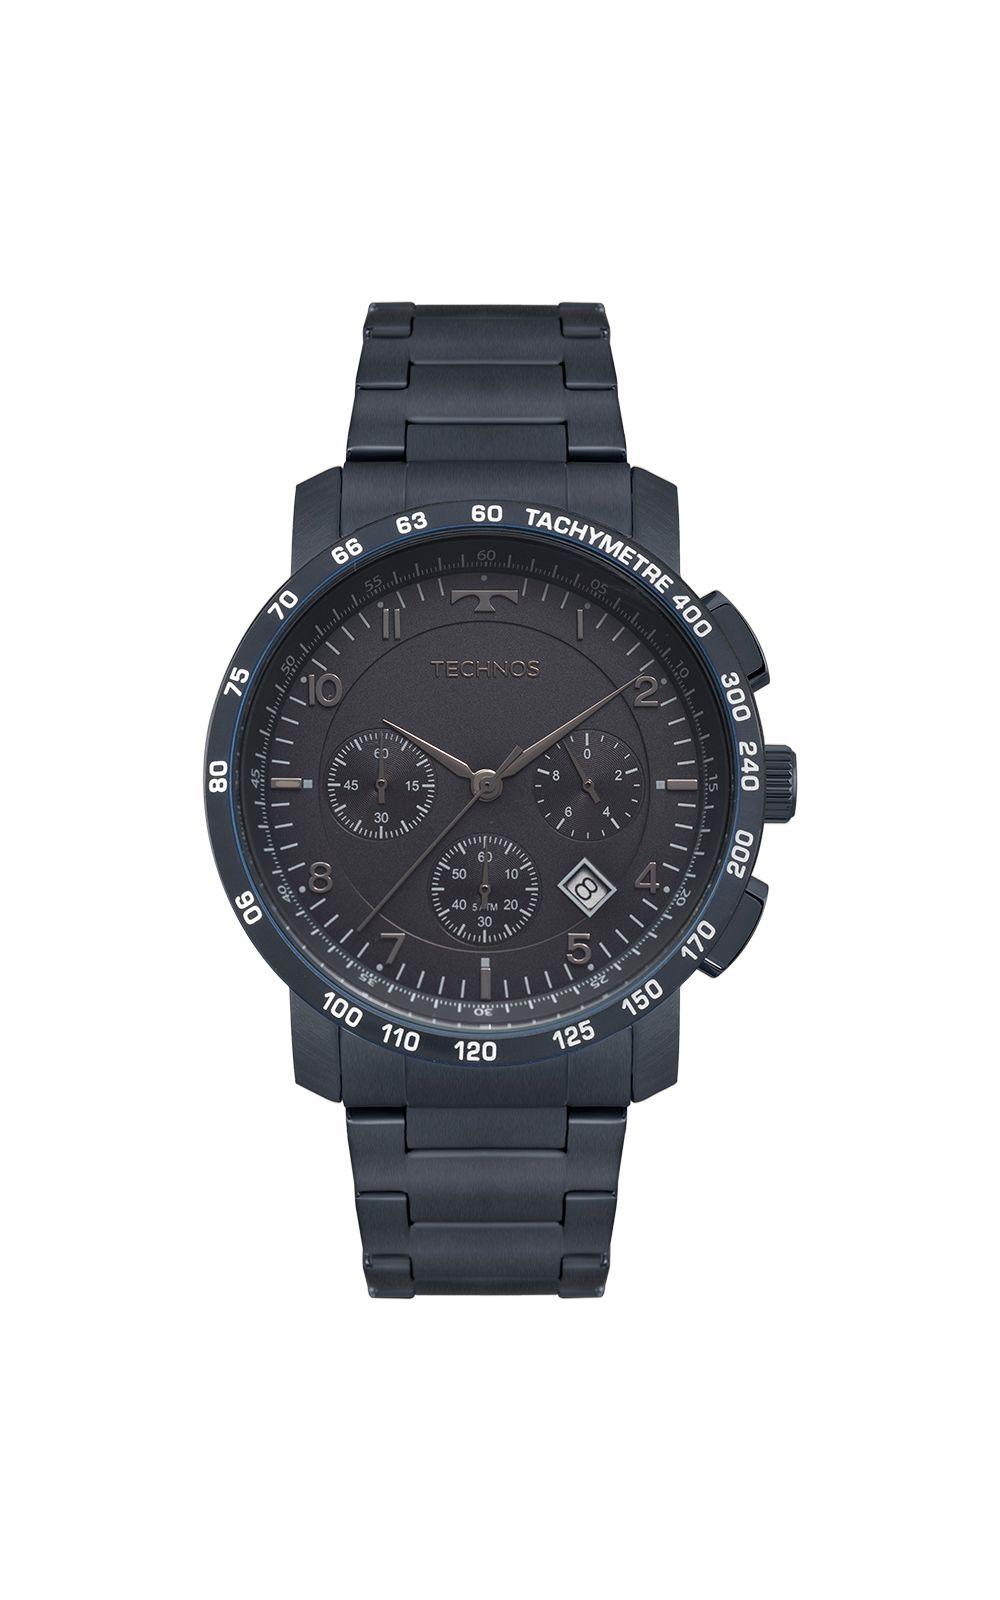 82f78df7d63 Relógio Technos Masculino Skymaster Azul 6S20AC 4A. undefined